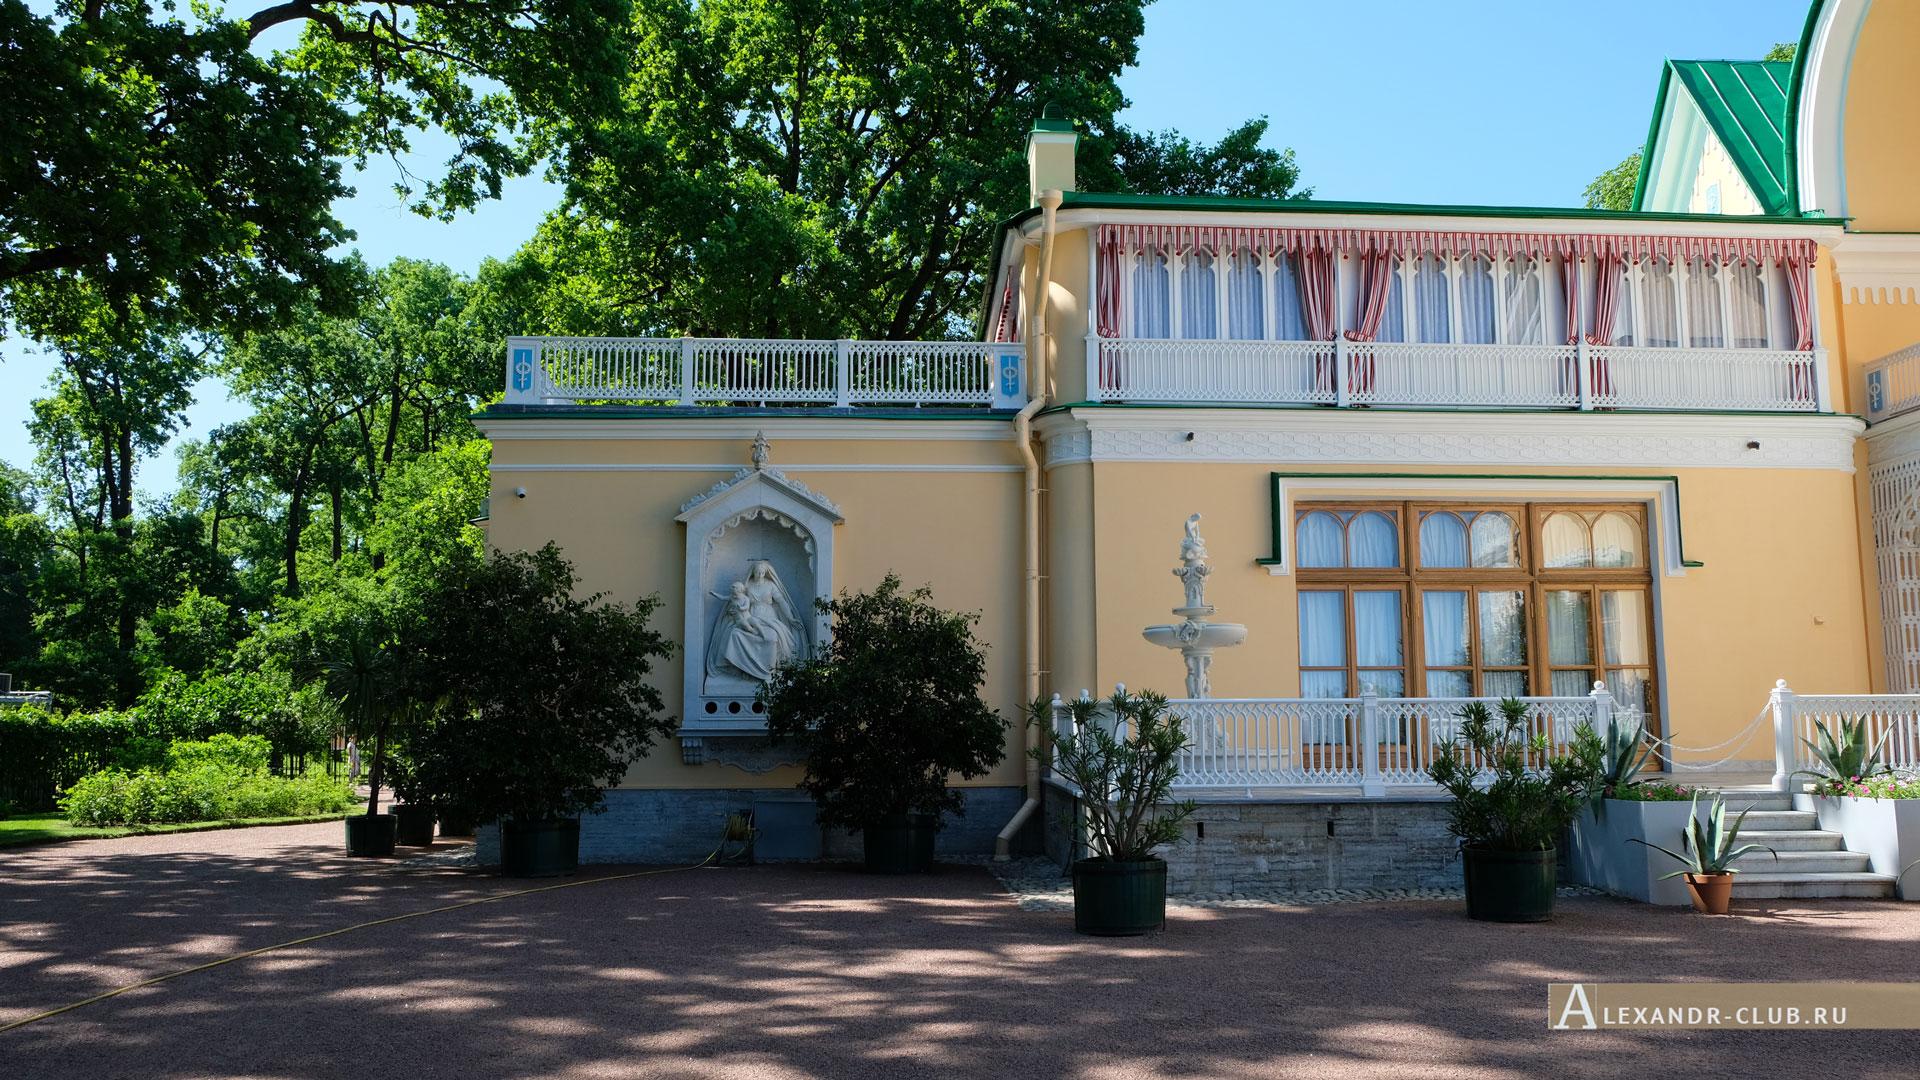 Петергоф, парк «Александрия», лето, дворец Коттедж